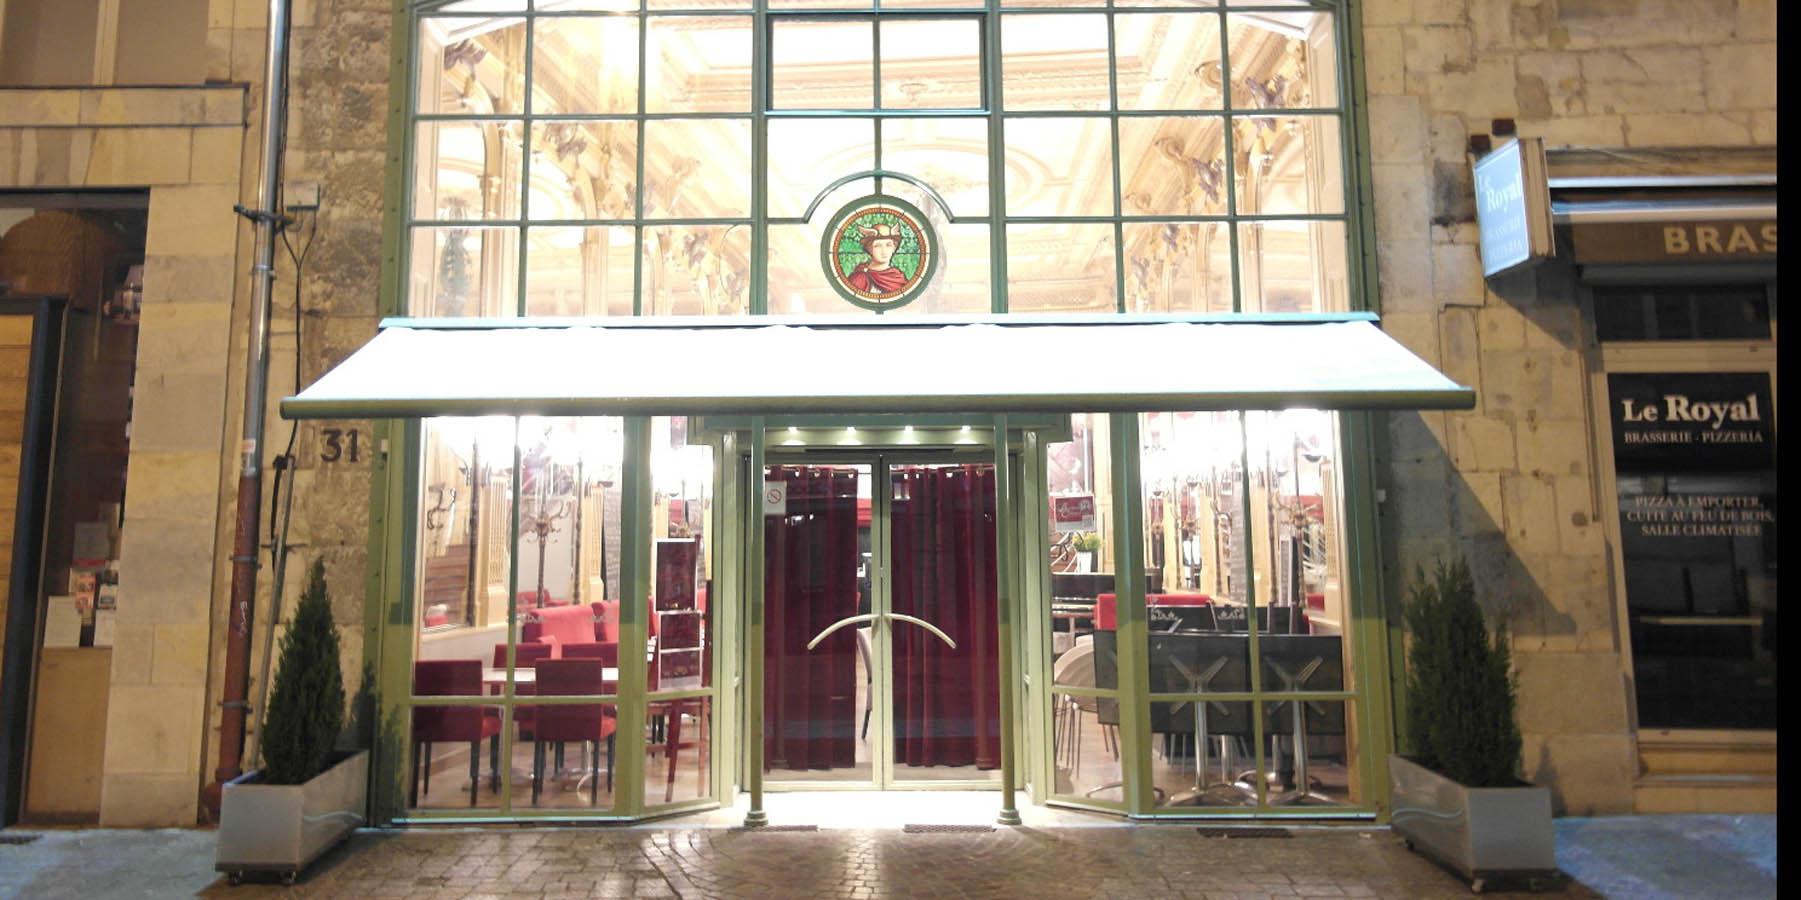 Splatsh-brasserie-du-commerce-besancon-3